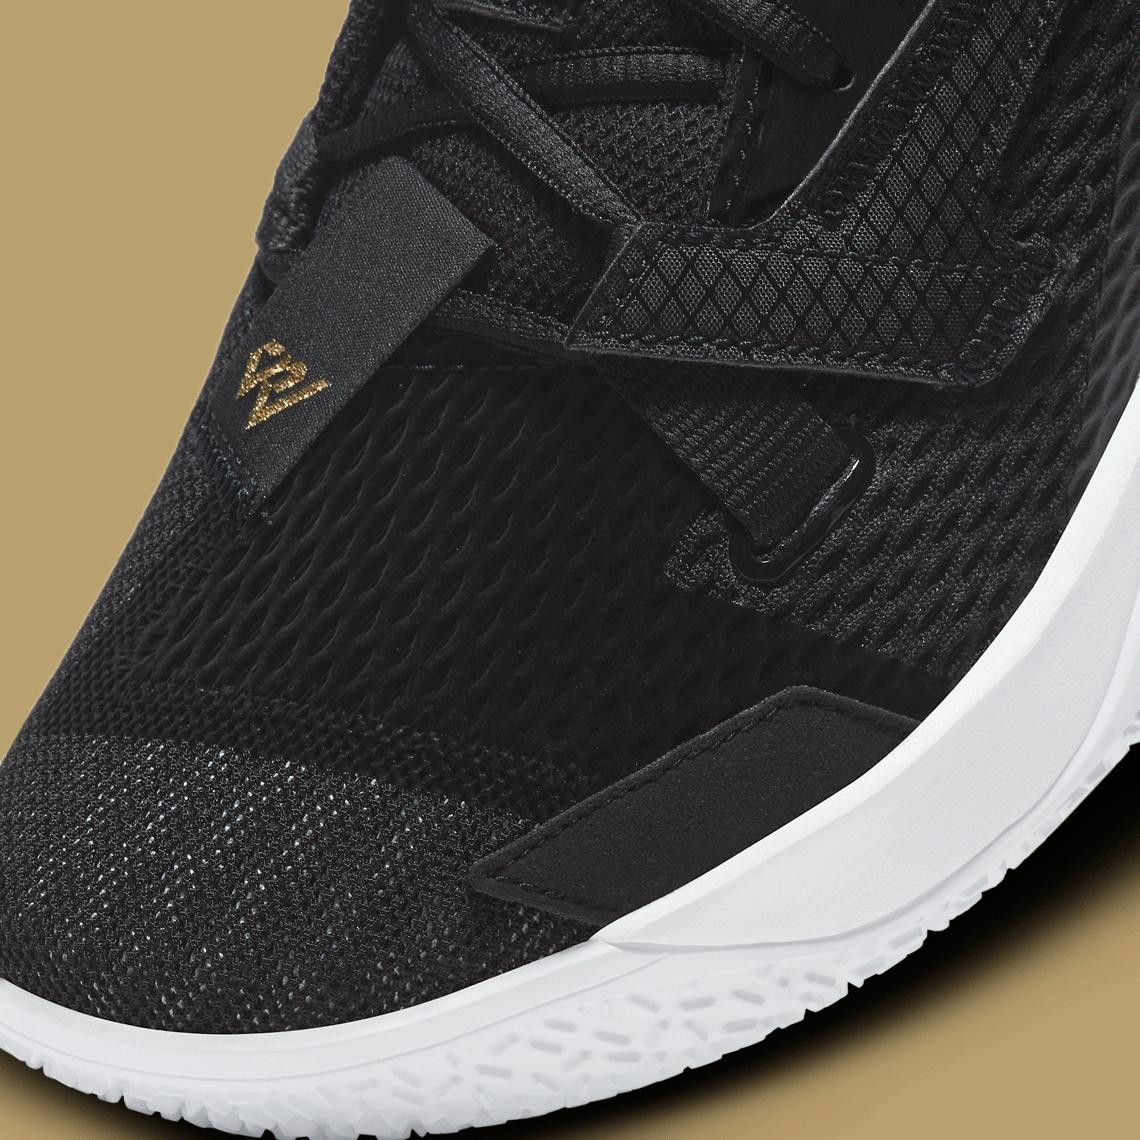 Jordan-Why-Not-Zer0-4-Family-CQ4231-001-2